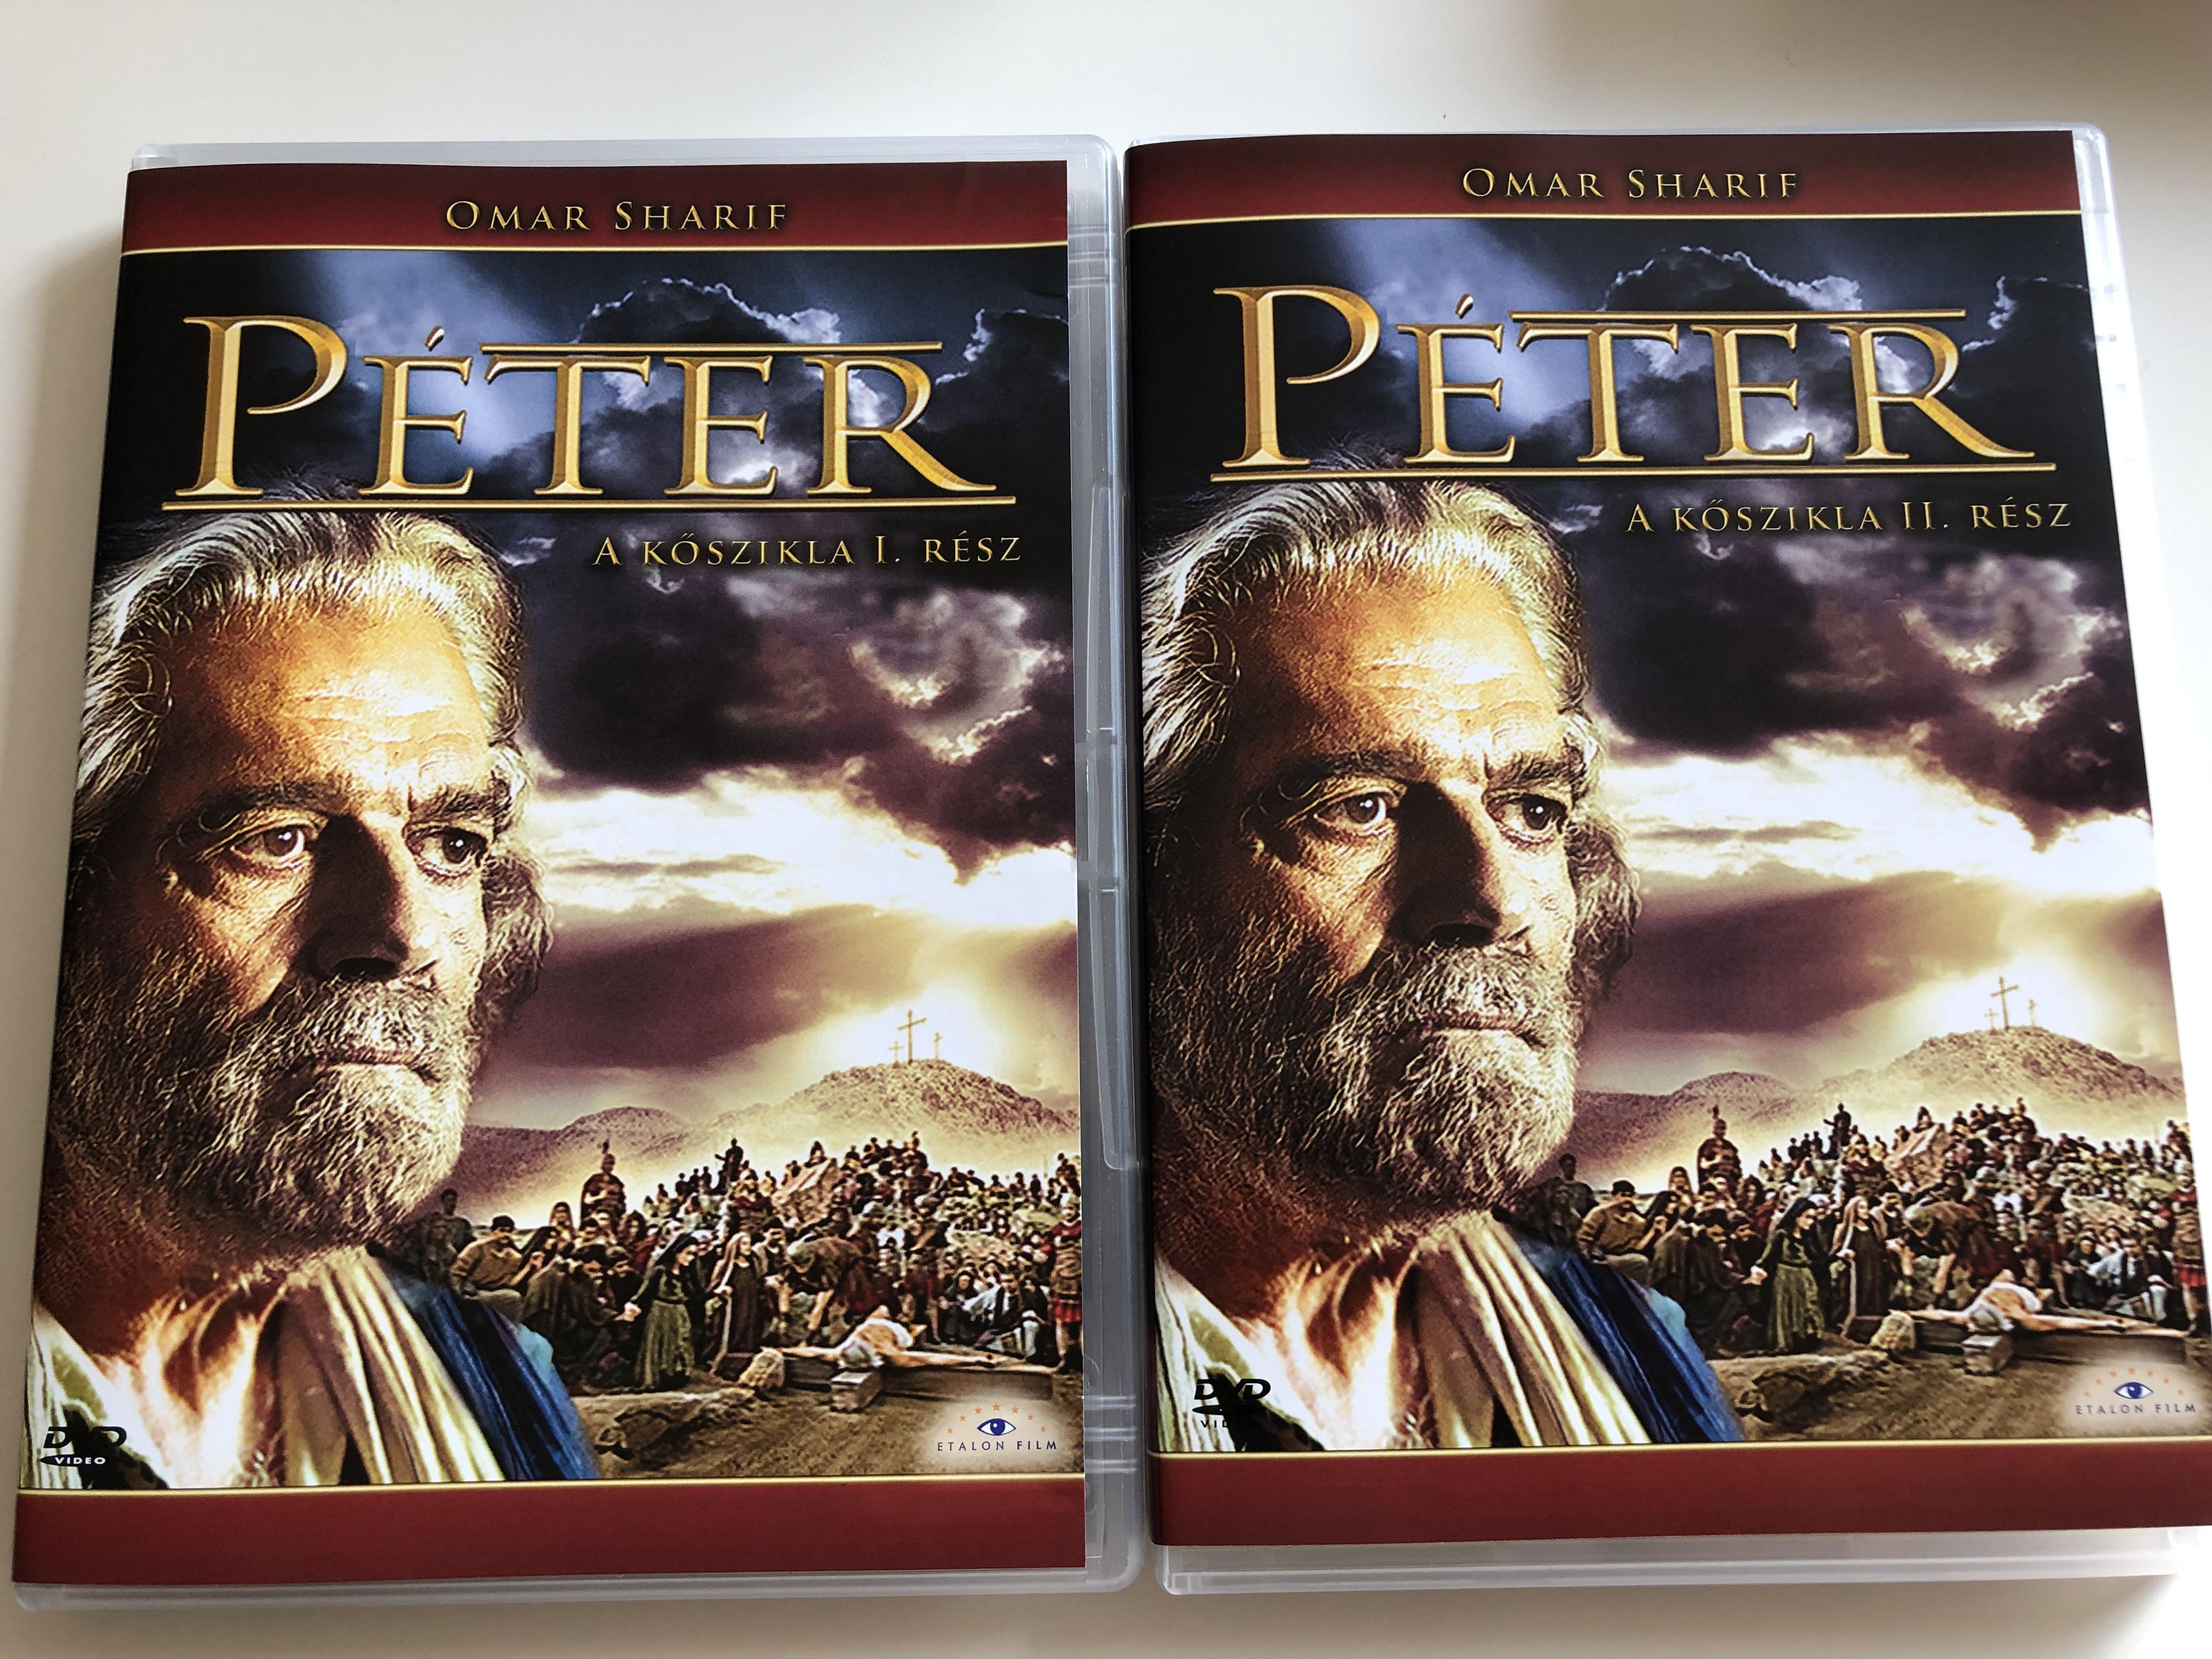 san-pietro-i-ii-dvd-set-2005-p-ter-a-k-szikla-i-ii.-r-sz-directed-by-giulio-base-starring-omar-sharif-daniele-pecci-flavio-insinna-claudia-koll-lina-sastri-johannes-brandrup-imperium-saint-peter-1-.jpg